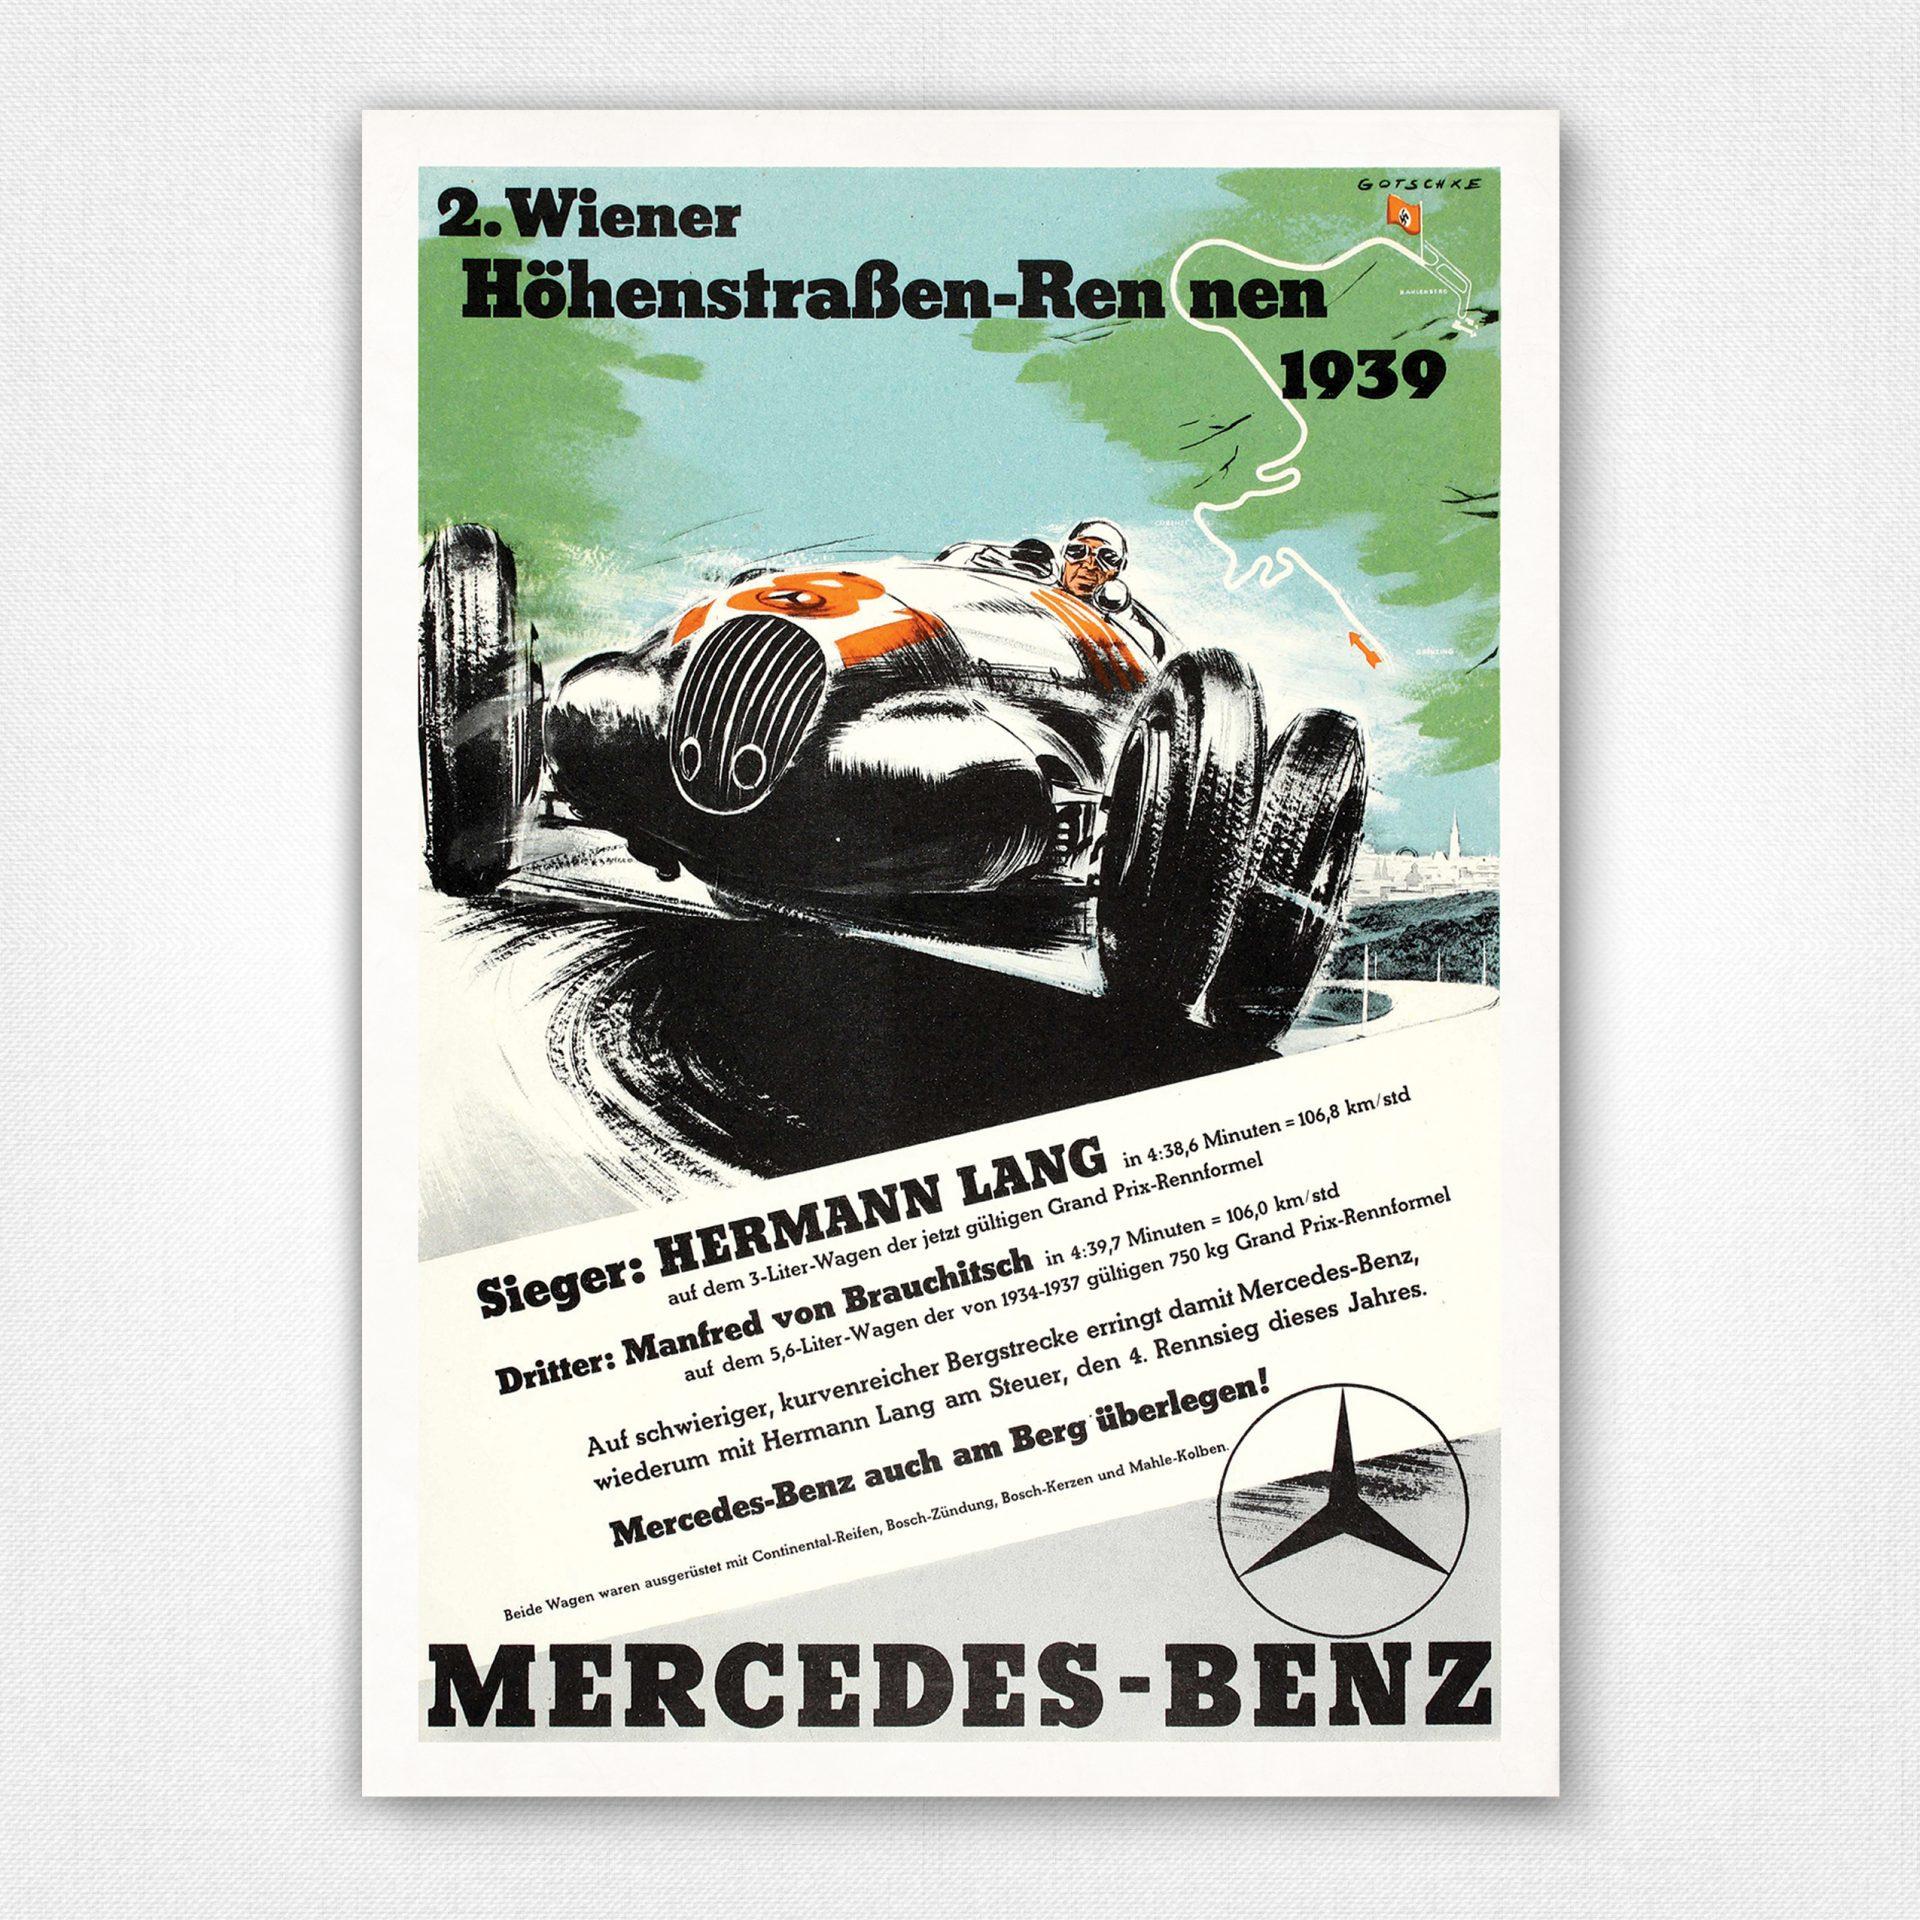 Poster Brooklands 500 mile Wall art Reproduction. 1937 motor racing advert